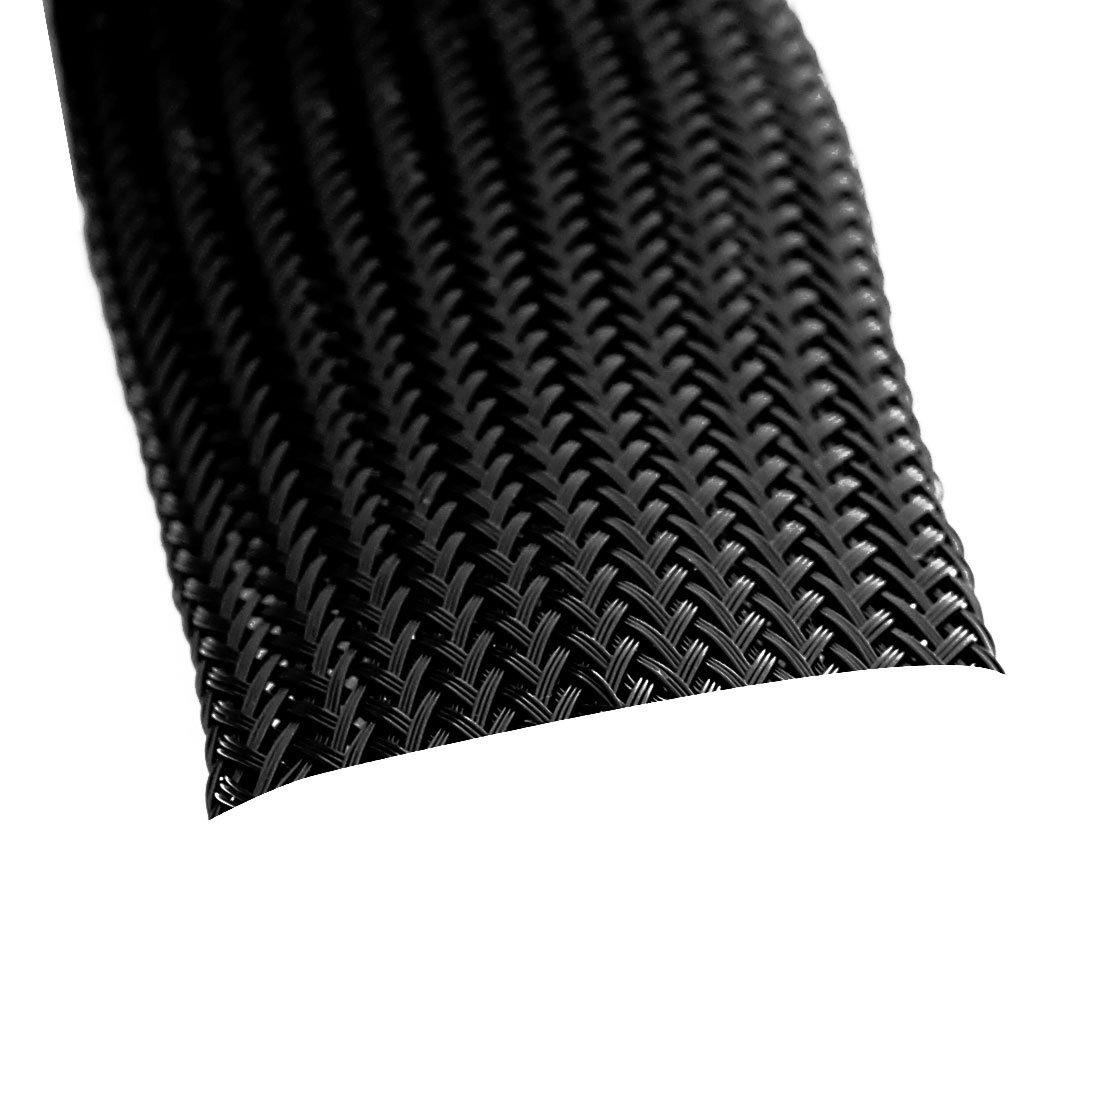 eDealMax a16070200ux0248 trenzado Funda extensible 1, 5 m 30 mm de ancho trenzado de nylon elástico Funda extensible Ramos de cables - - Amazon.com